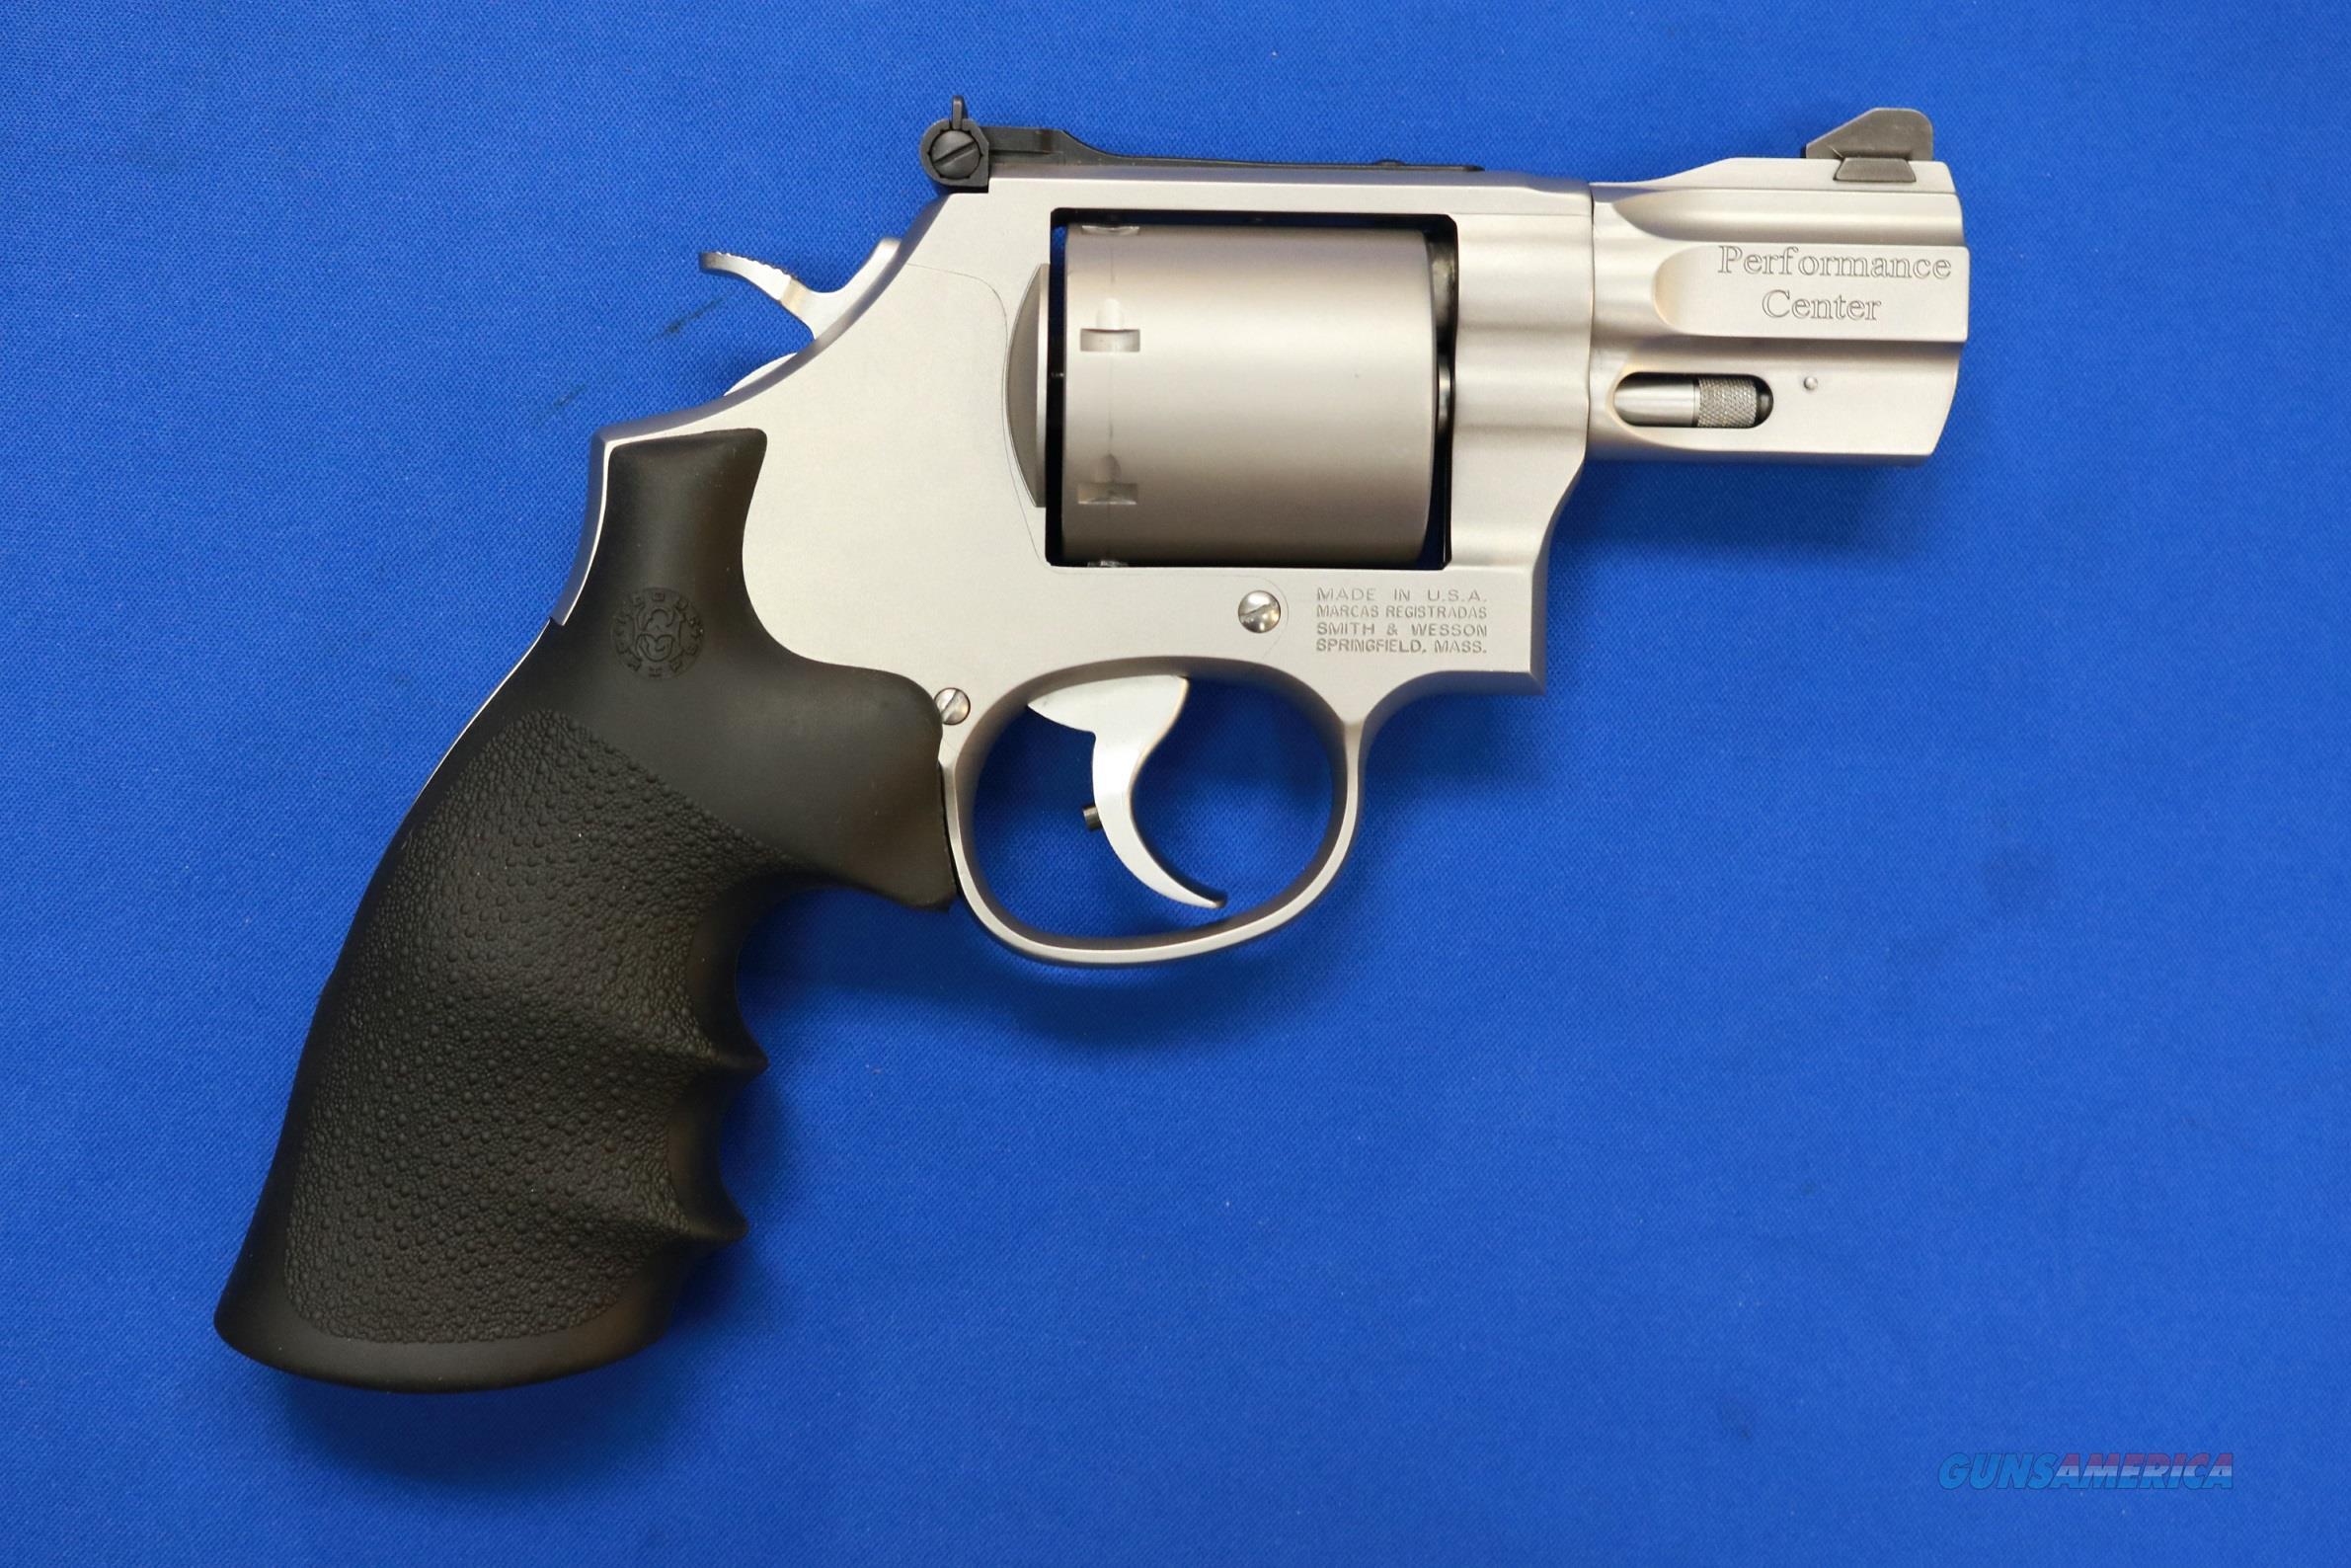 SMITH & WESSON 686 PERFORMANCE CENTER 7x .357 MA  Guns > Pistols > Smith & Wesson Revolvers > Performance Center